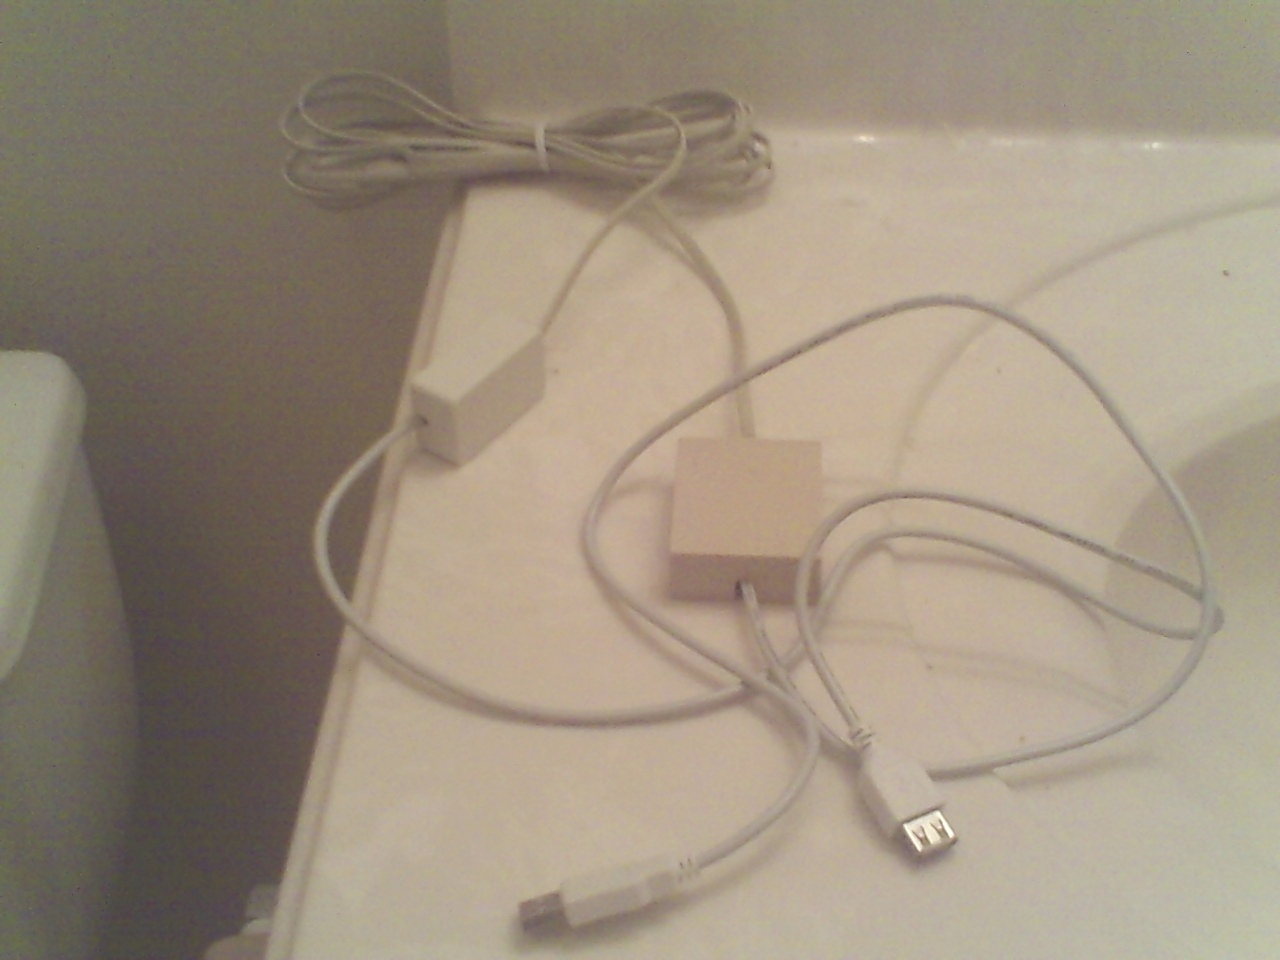 Picture of Solderless USB Extender